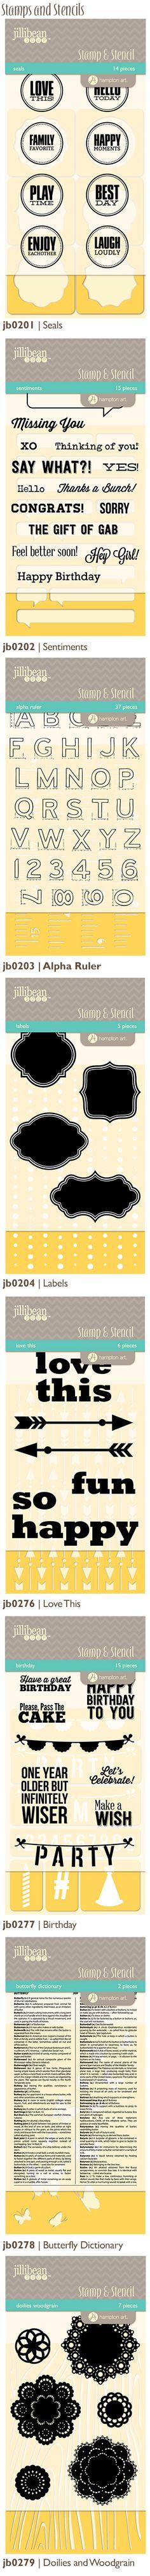 Jillibean Soup Stamps & Stencils